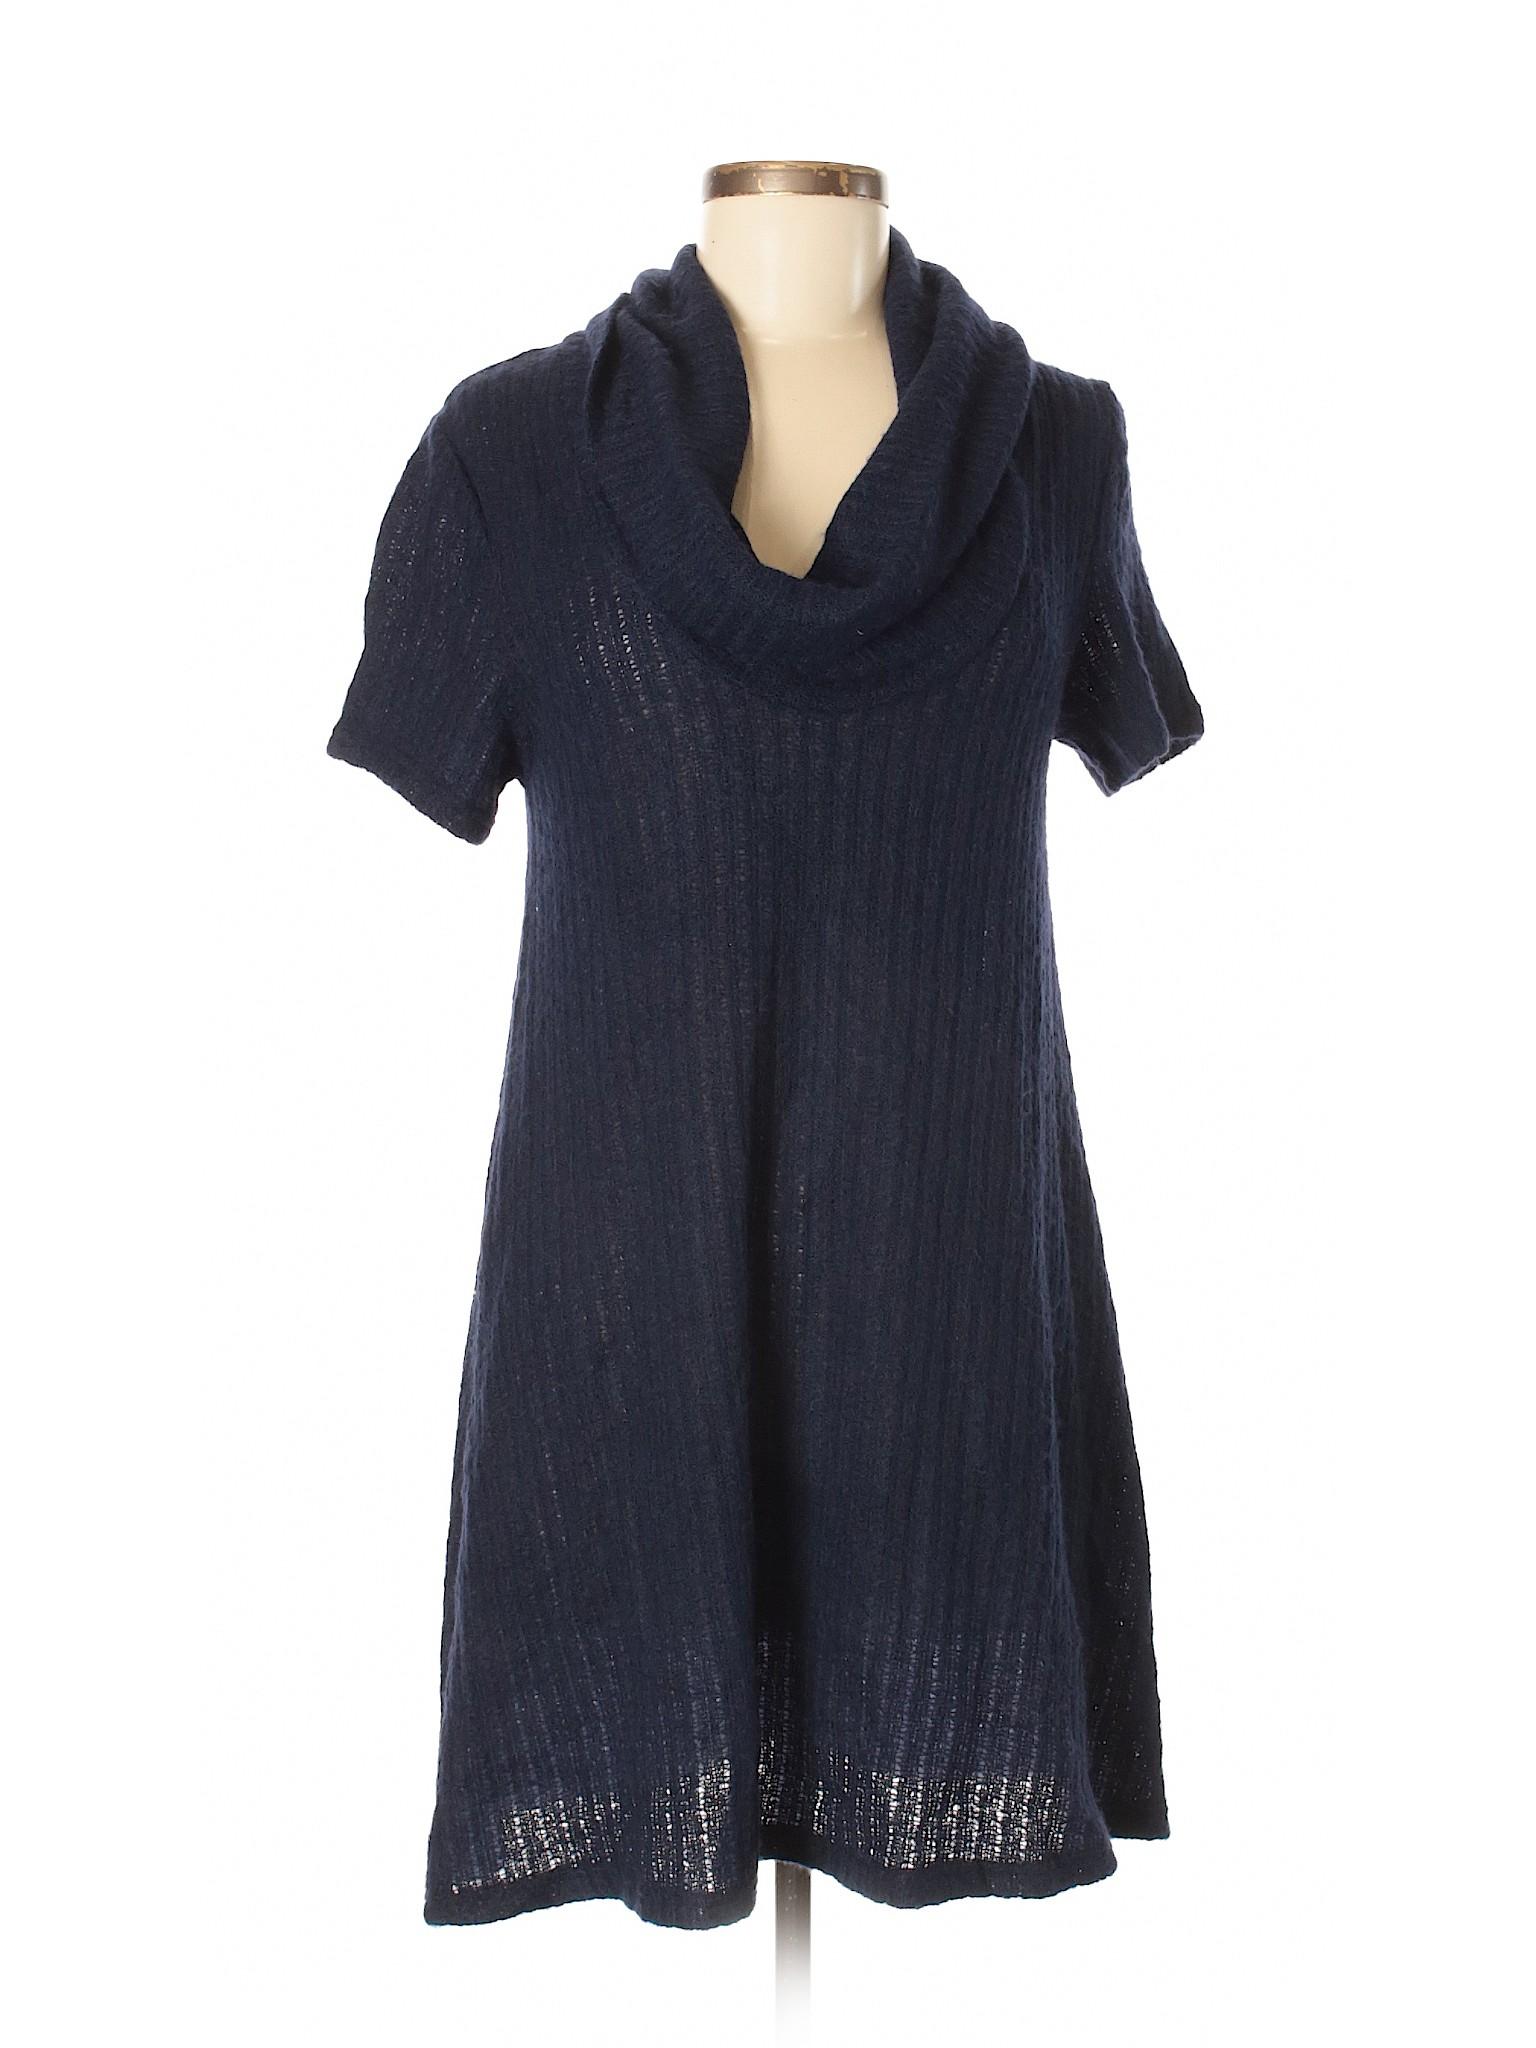 Dress winter Boutique Boutique Casual TOBI winter Casual TOBI Dress xpP1q7A4n